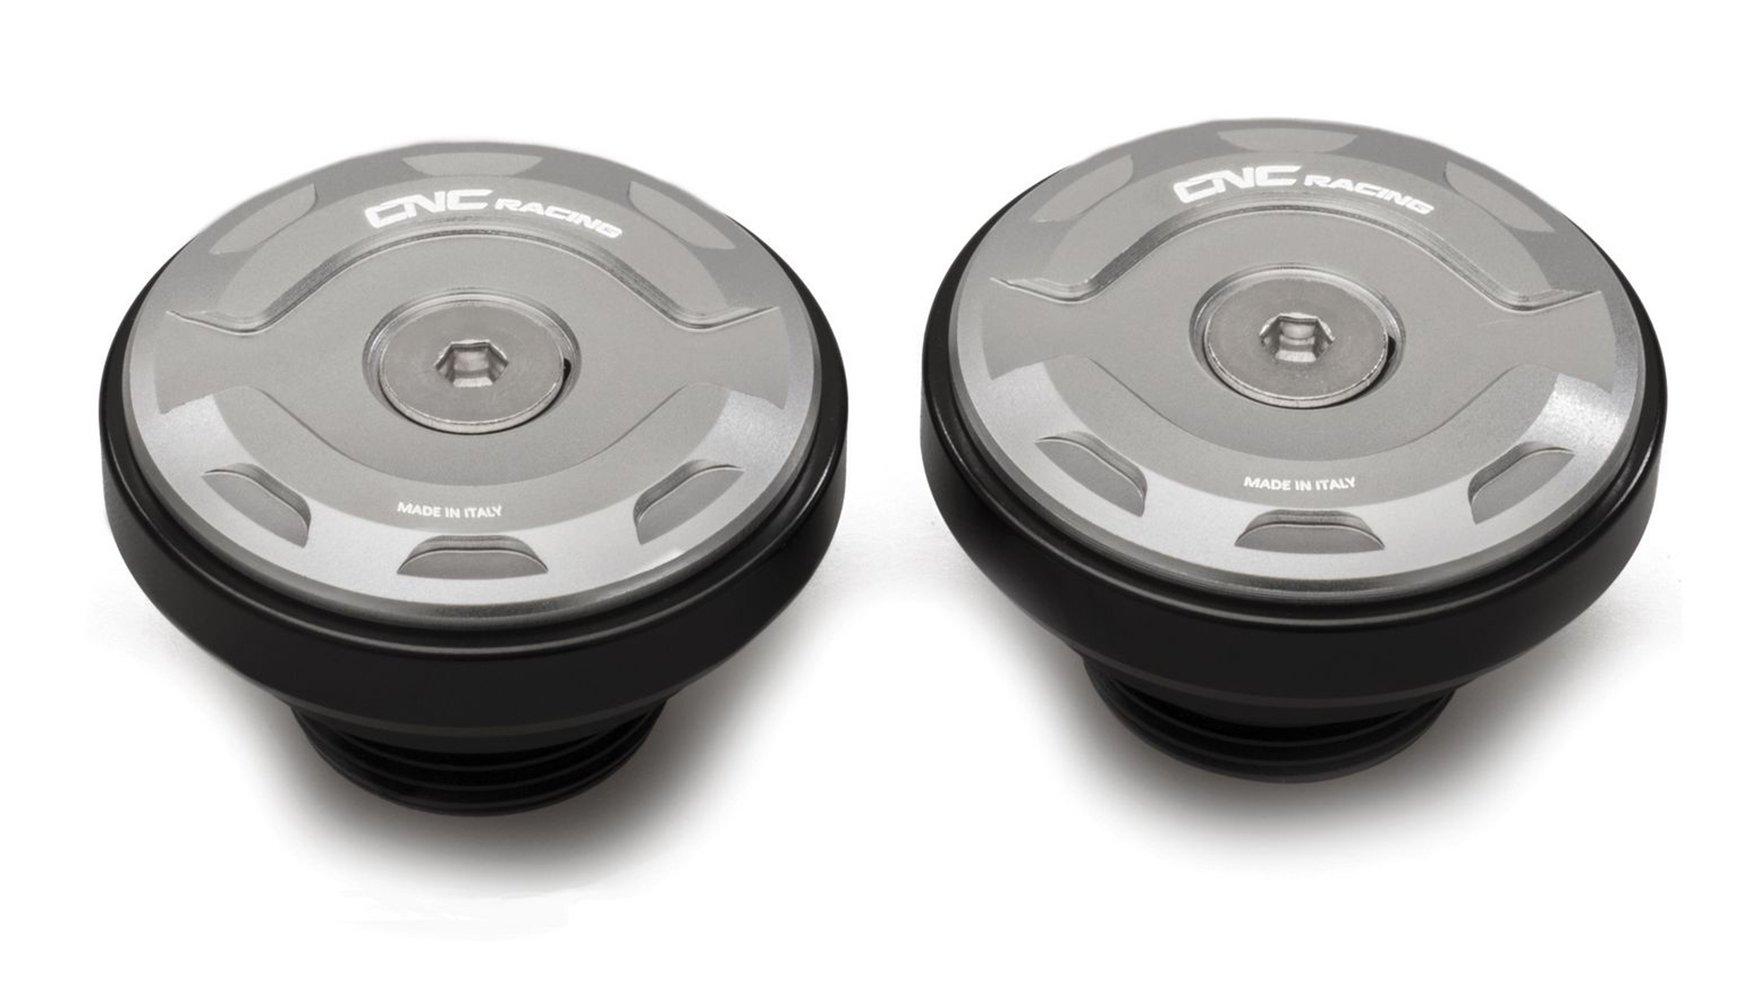 Заглушки в ось маятника CNC RACING PEV04S Silver для Ducati Diavel 19-20 / XDiavel 16-20